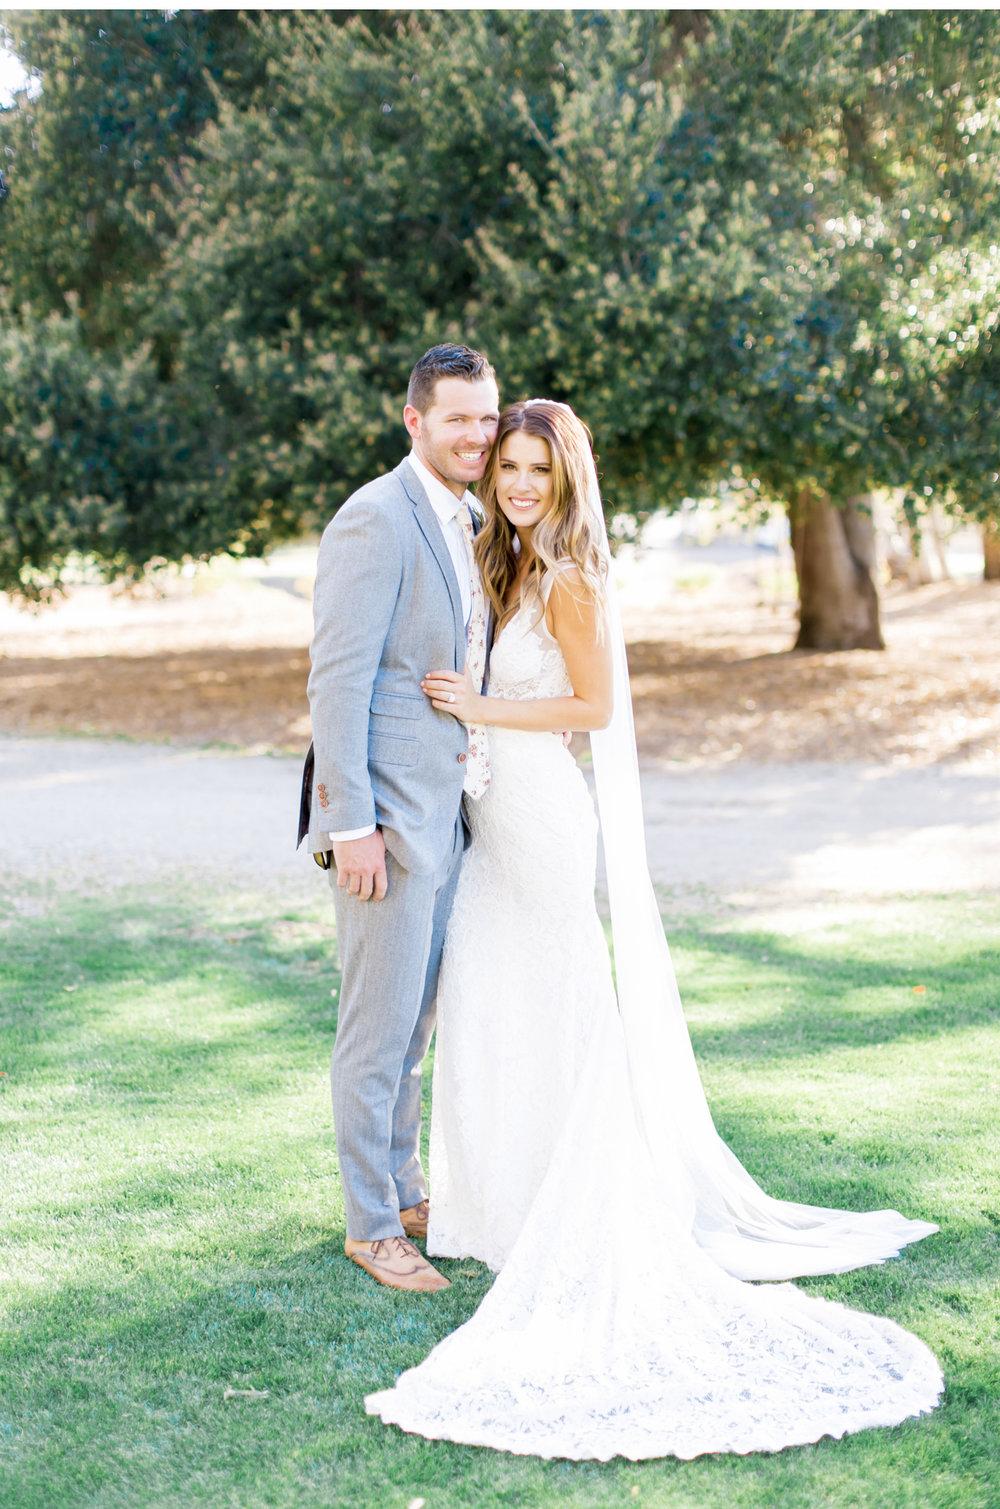 Malibu-Wedding-Photographer-Triunfo-Creek-Natalie-Schutt-Photography_05.jpg